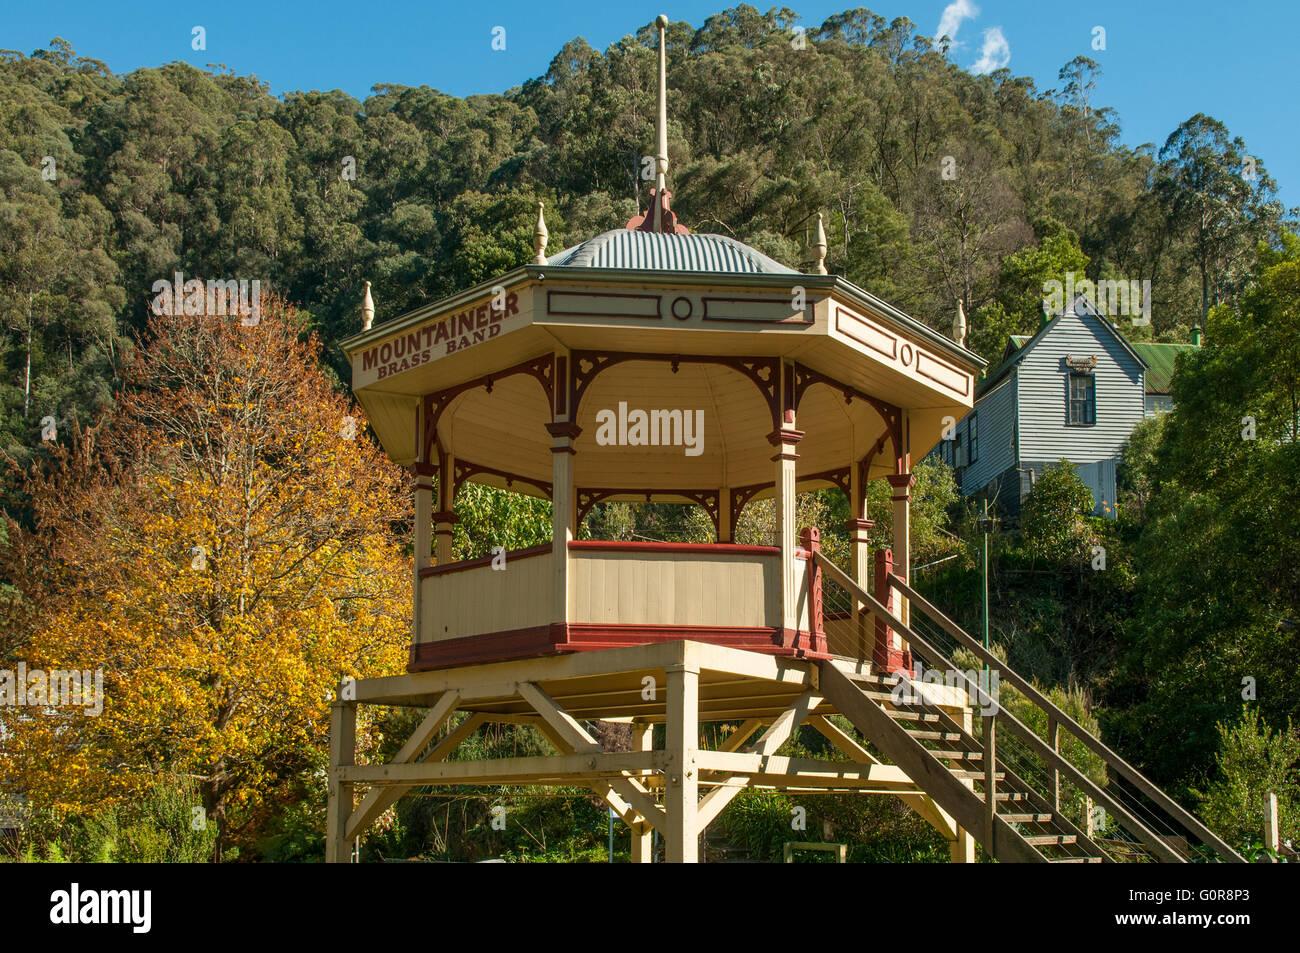 Mountaineer Brass Bandstand, Walhalla, Victoria, Australia - Stock Image